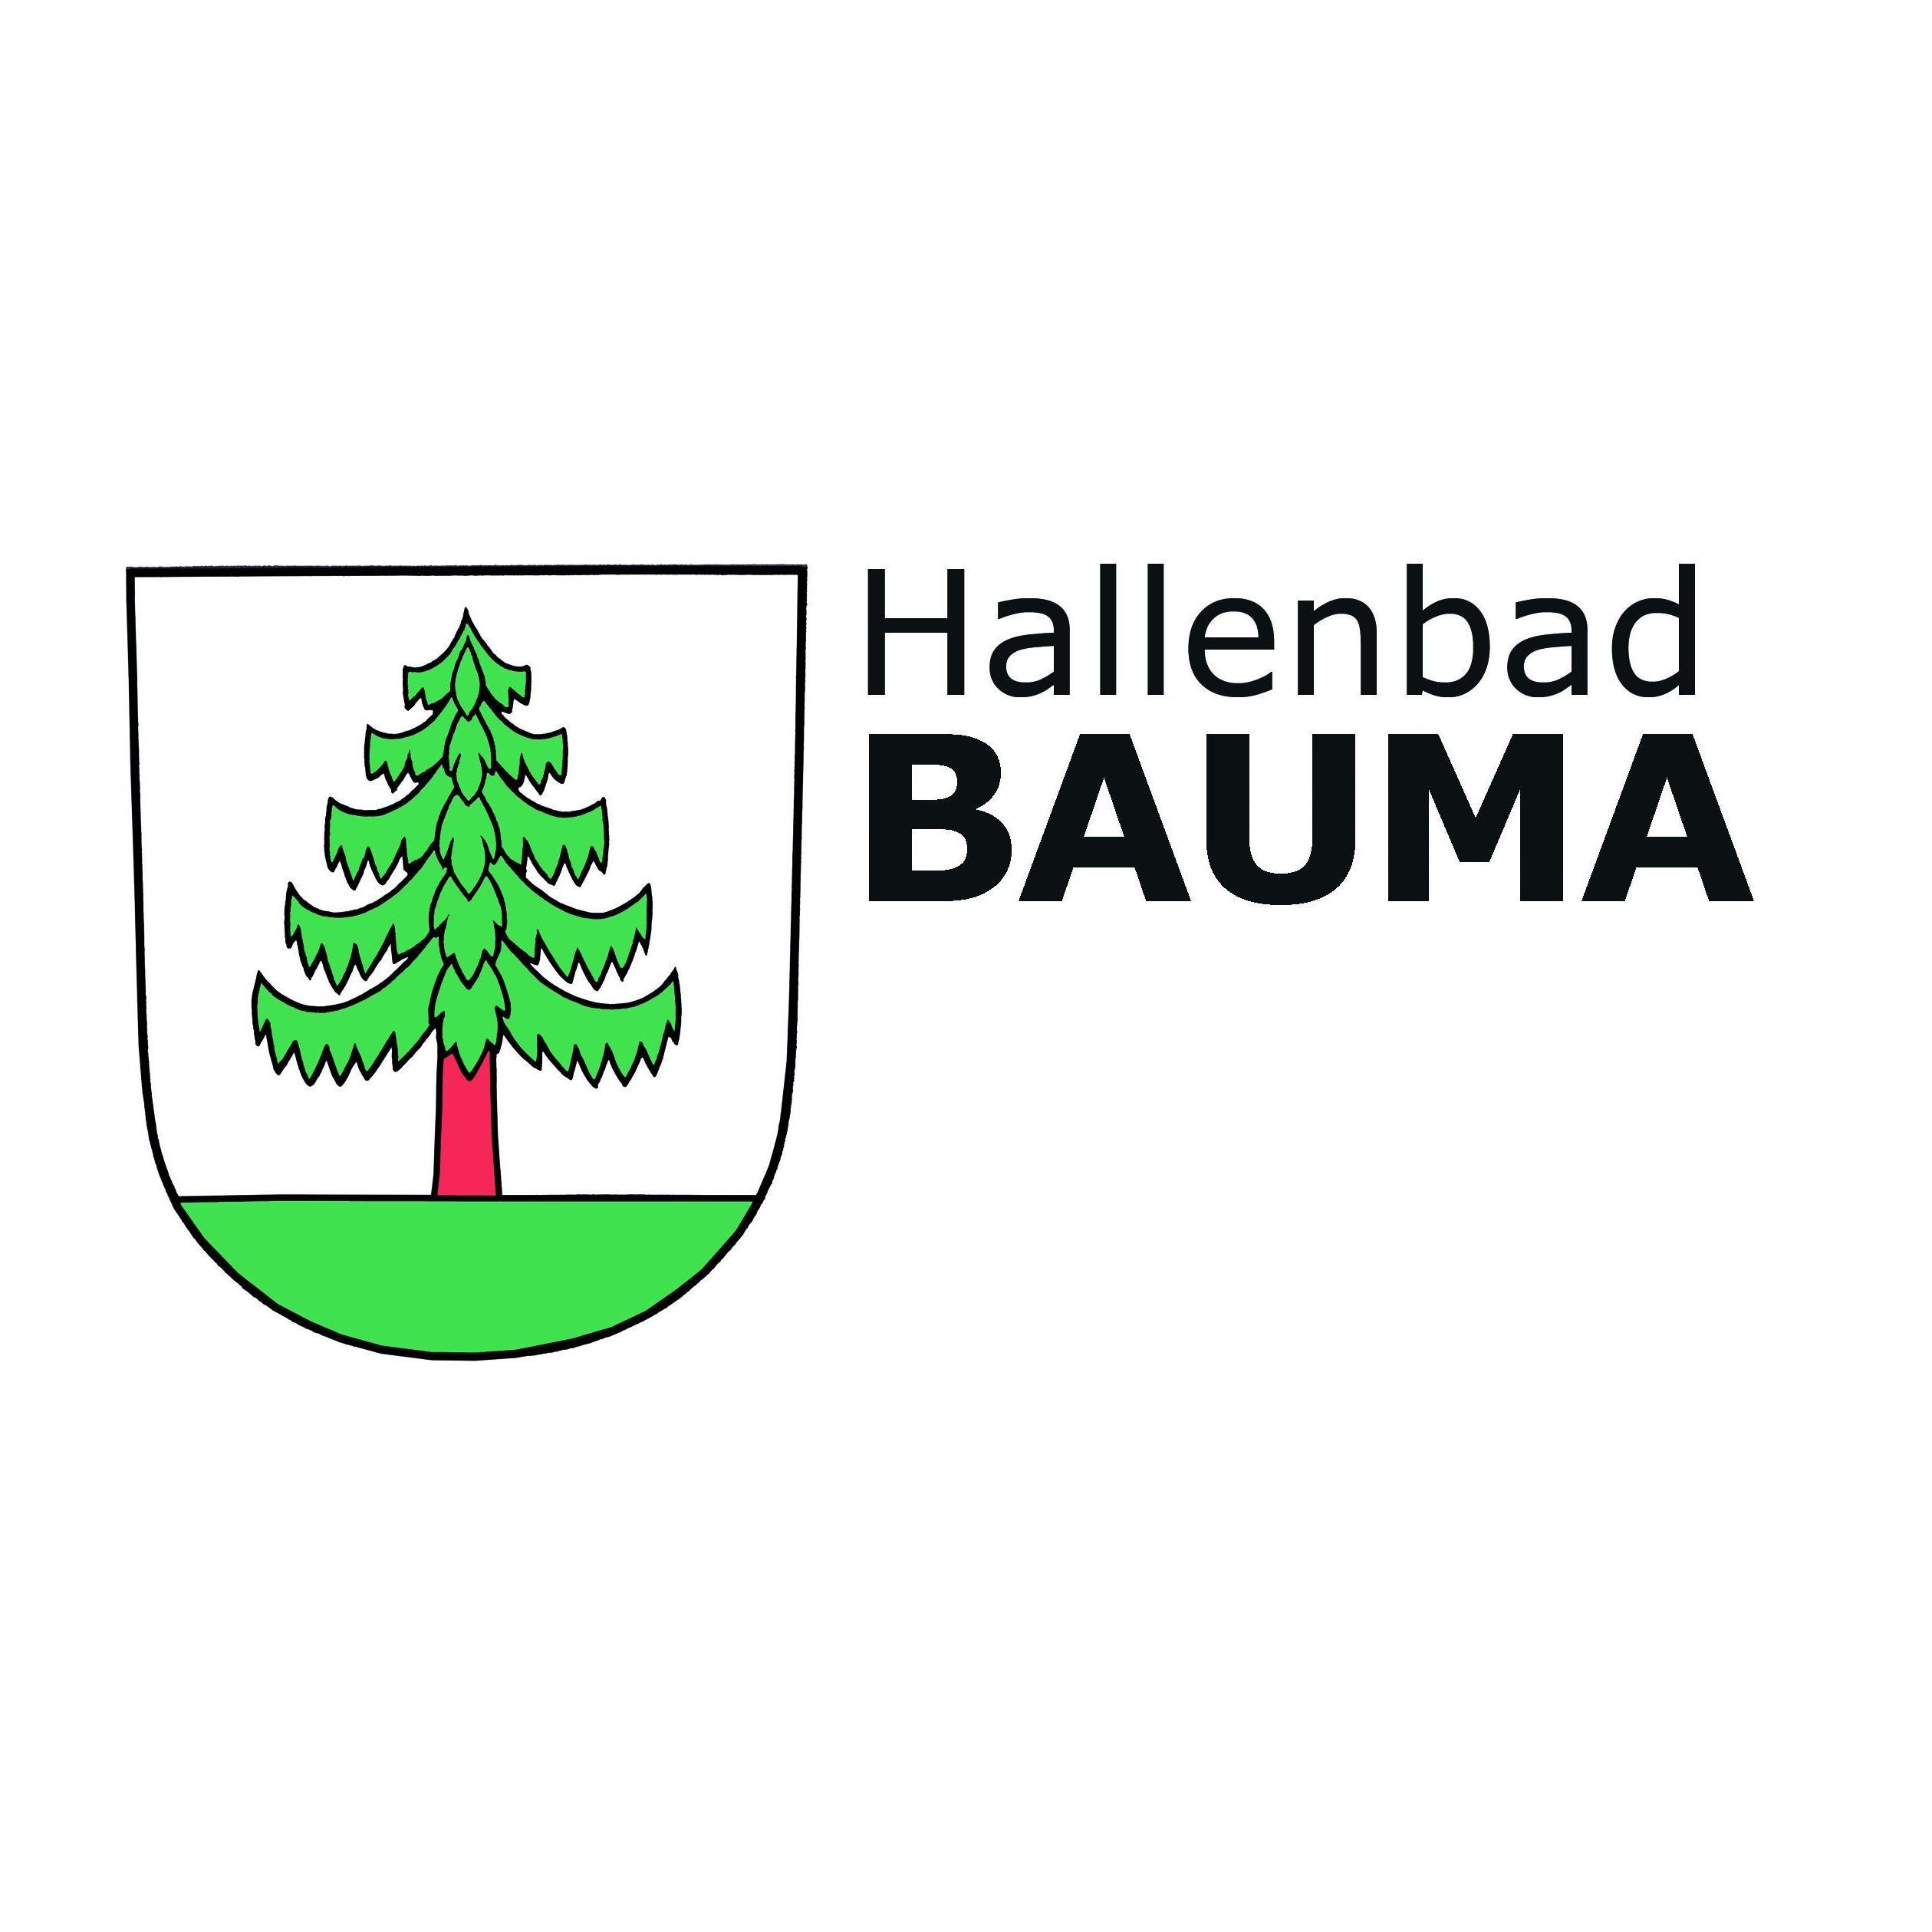 Hallenbad Bauma